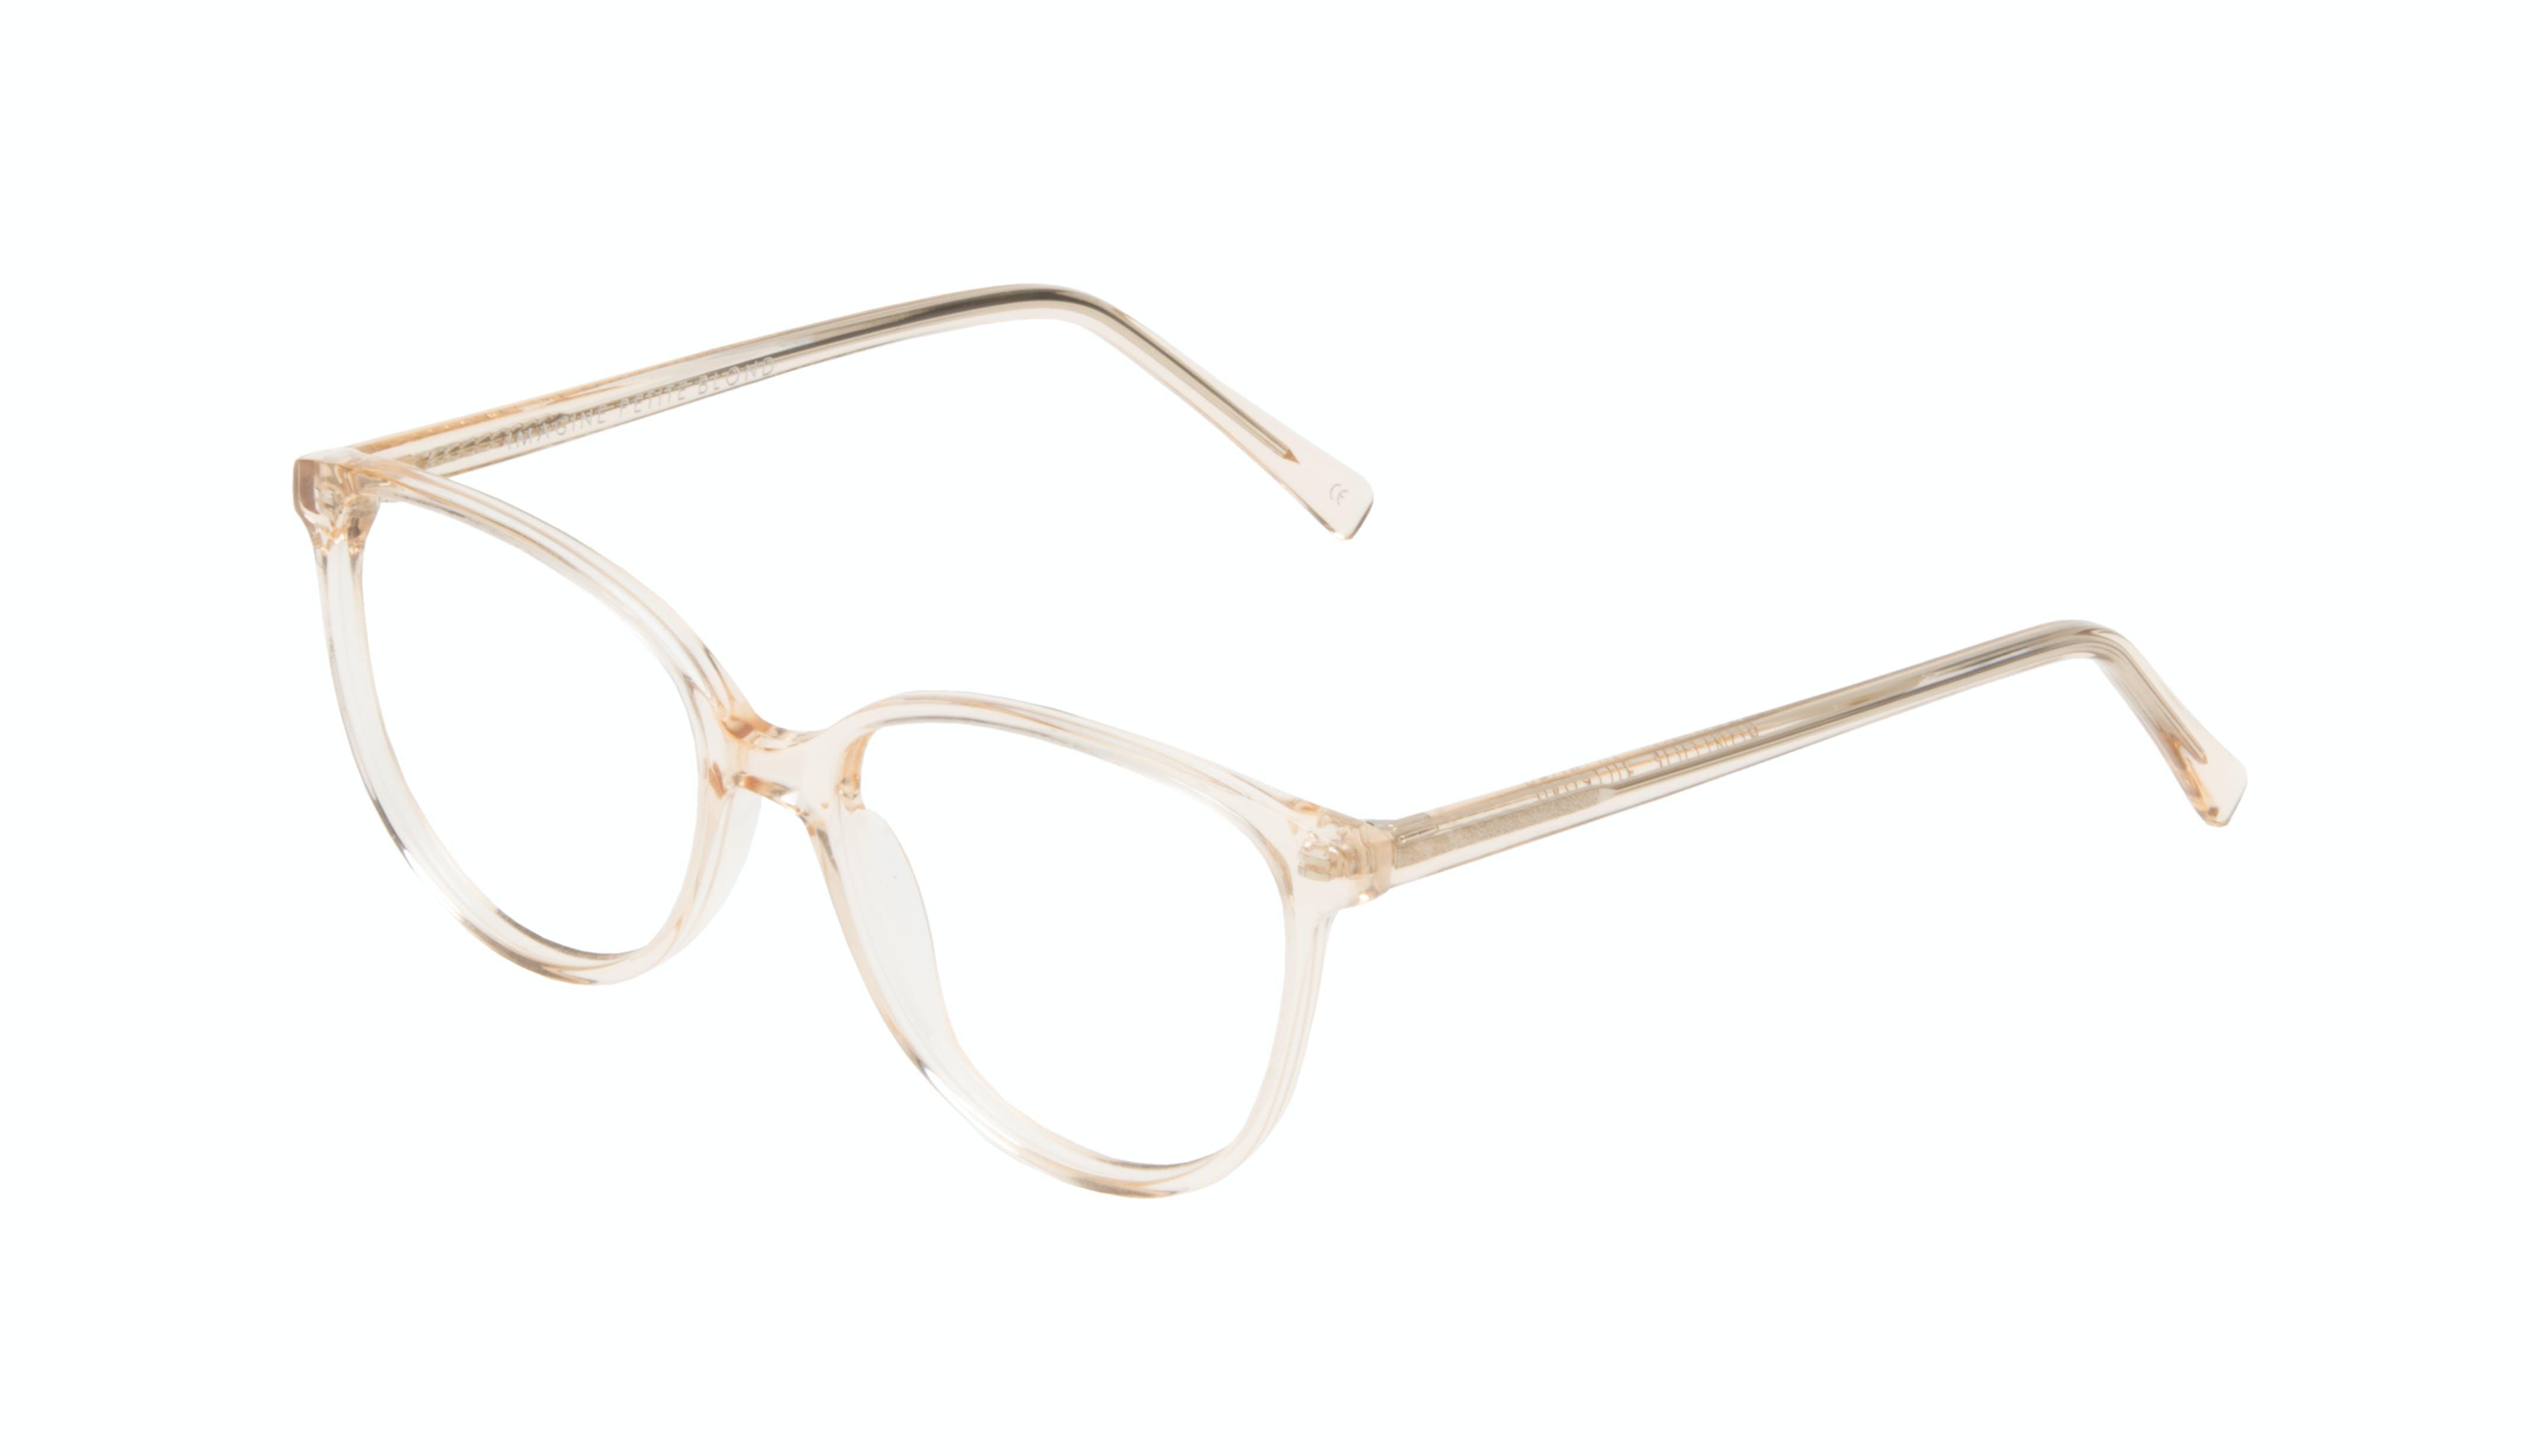 Affordable Fashion Glasses Round Eyeglasses Women Imagine Petite Blond Tilt